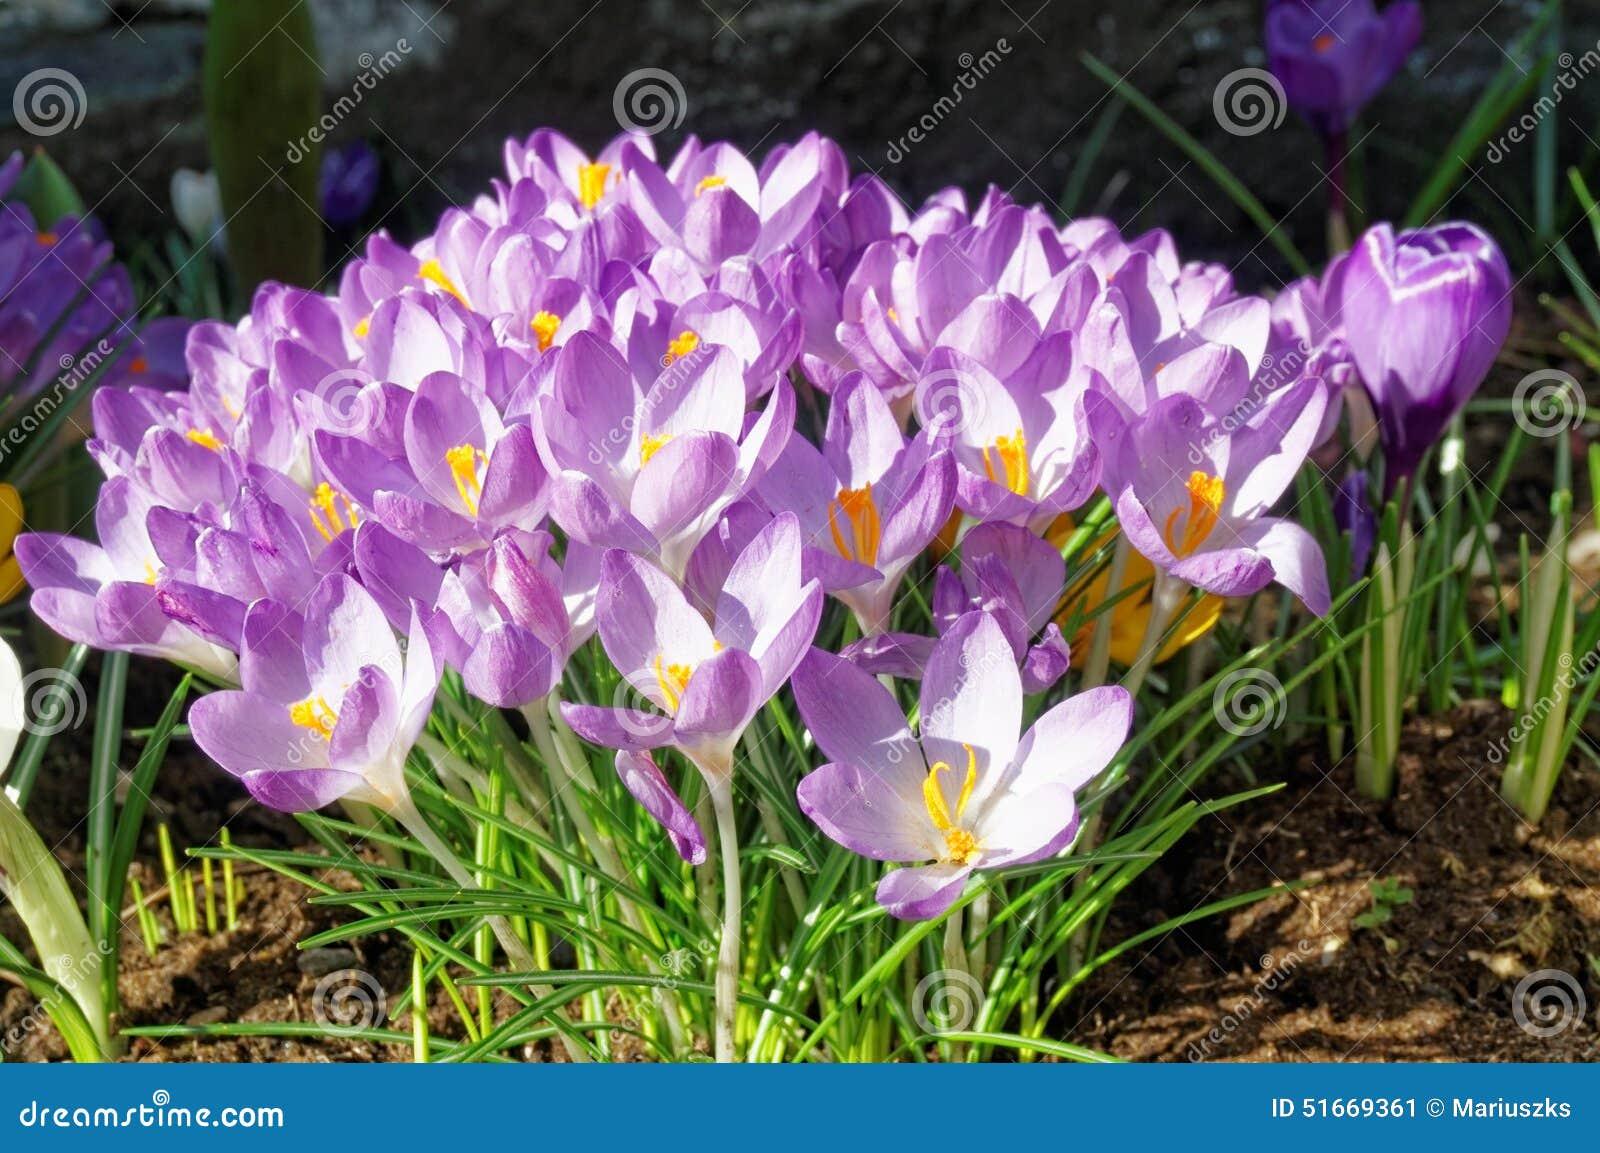 Crocus Longiflorus Flowers In Spring Norway Stock Image Image Of